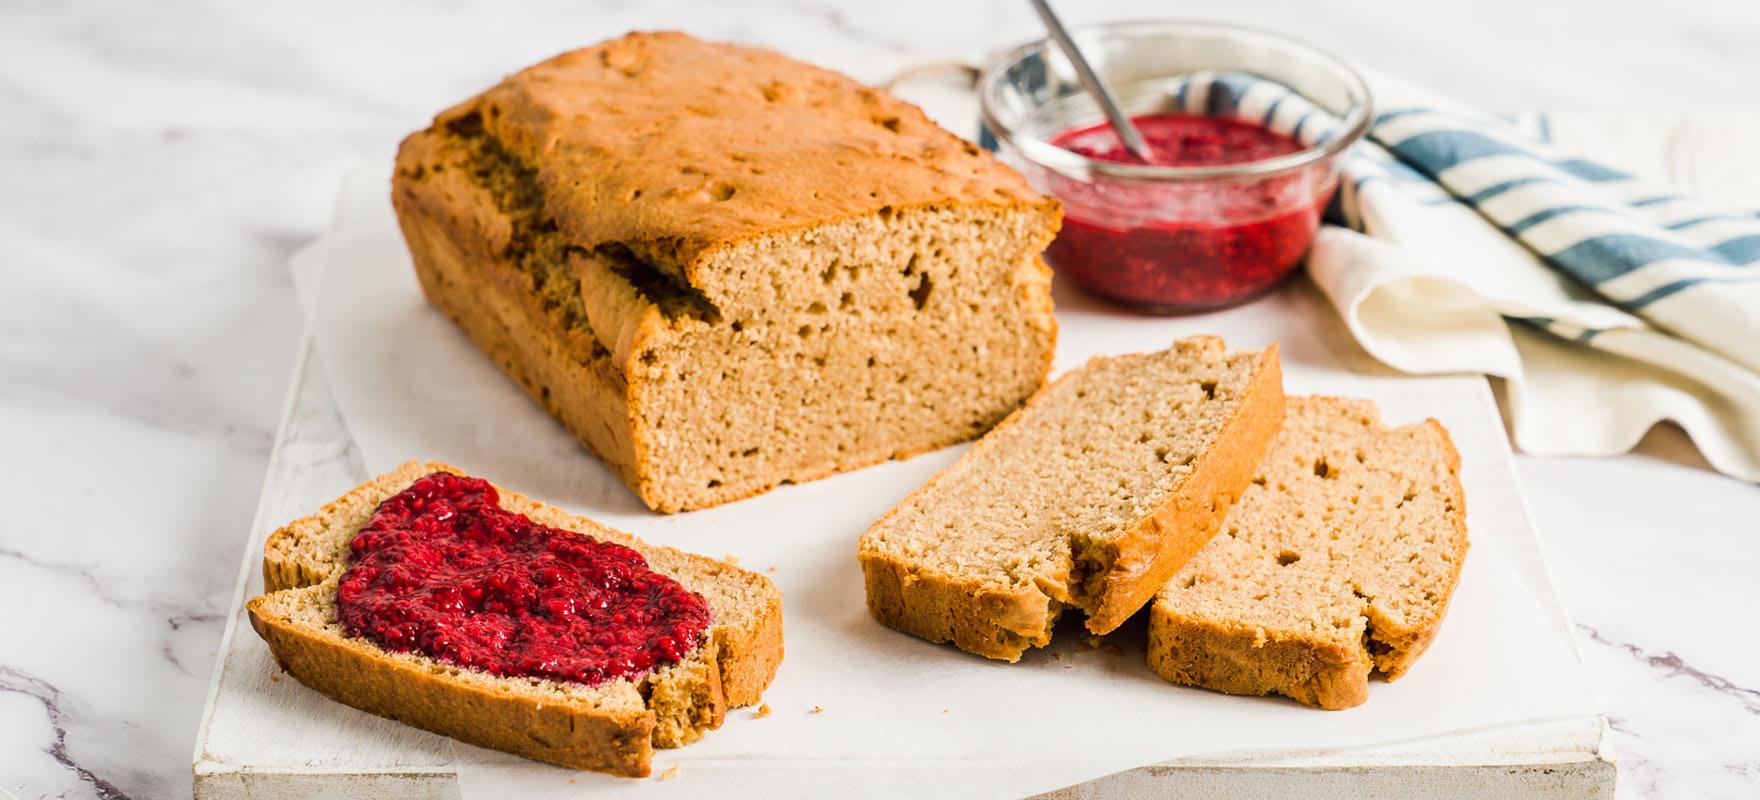 Vegan 5-Ingredient Peanut Butter Bread image 1